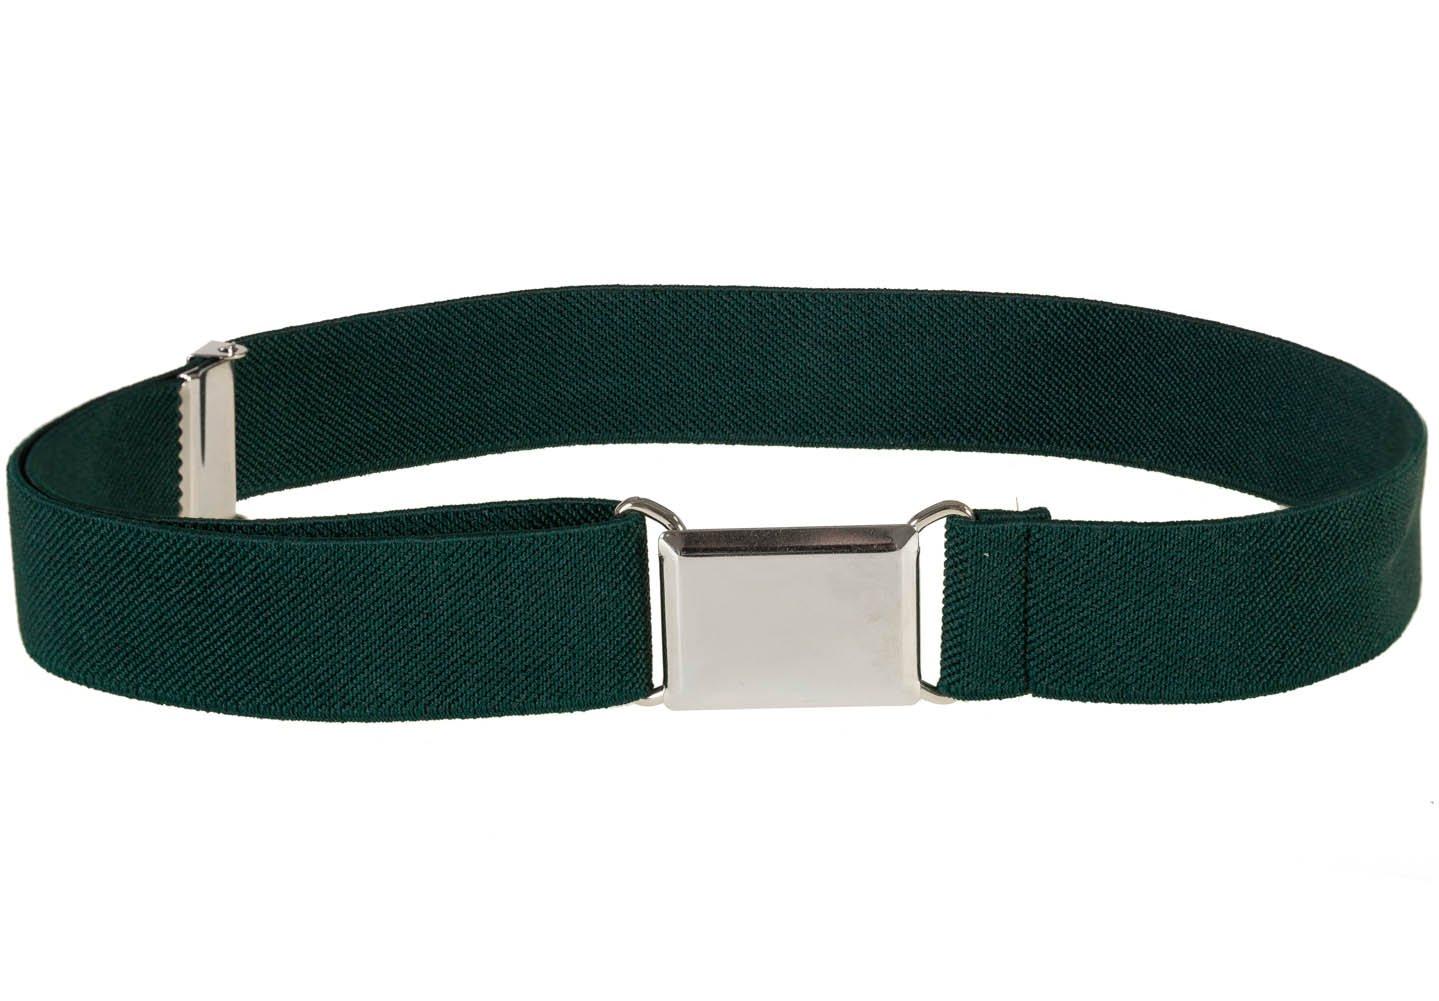 Kids Elastic Adjustable Strech Belt With Silver Square Buckle - Hunter Green